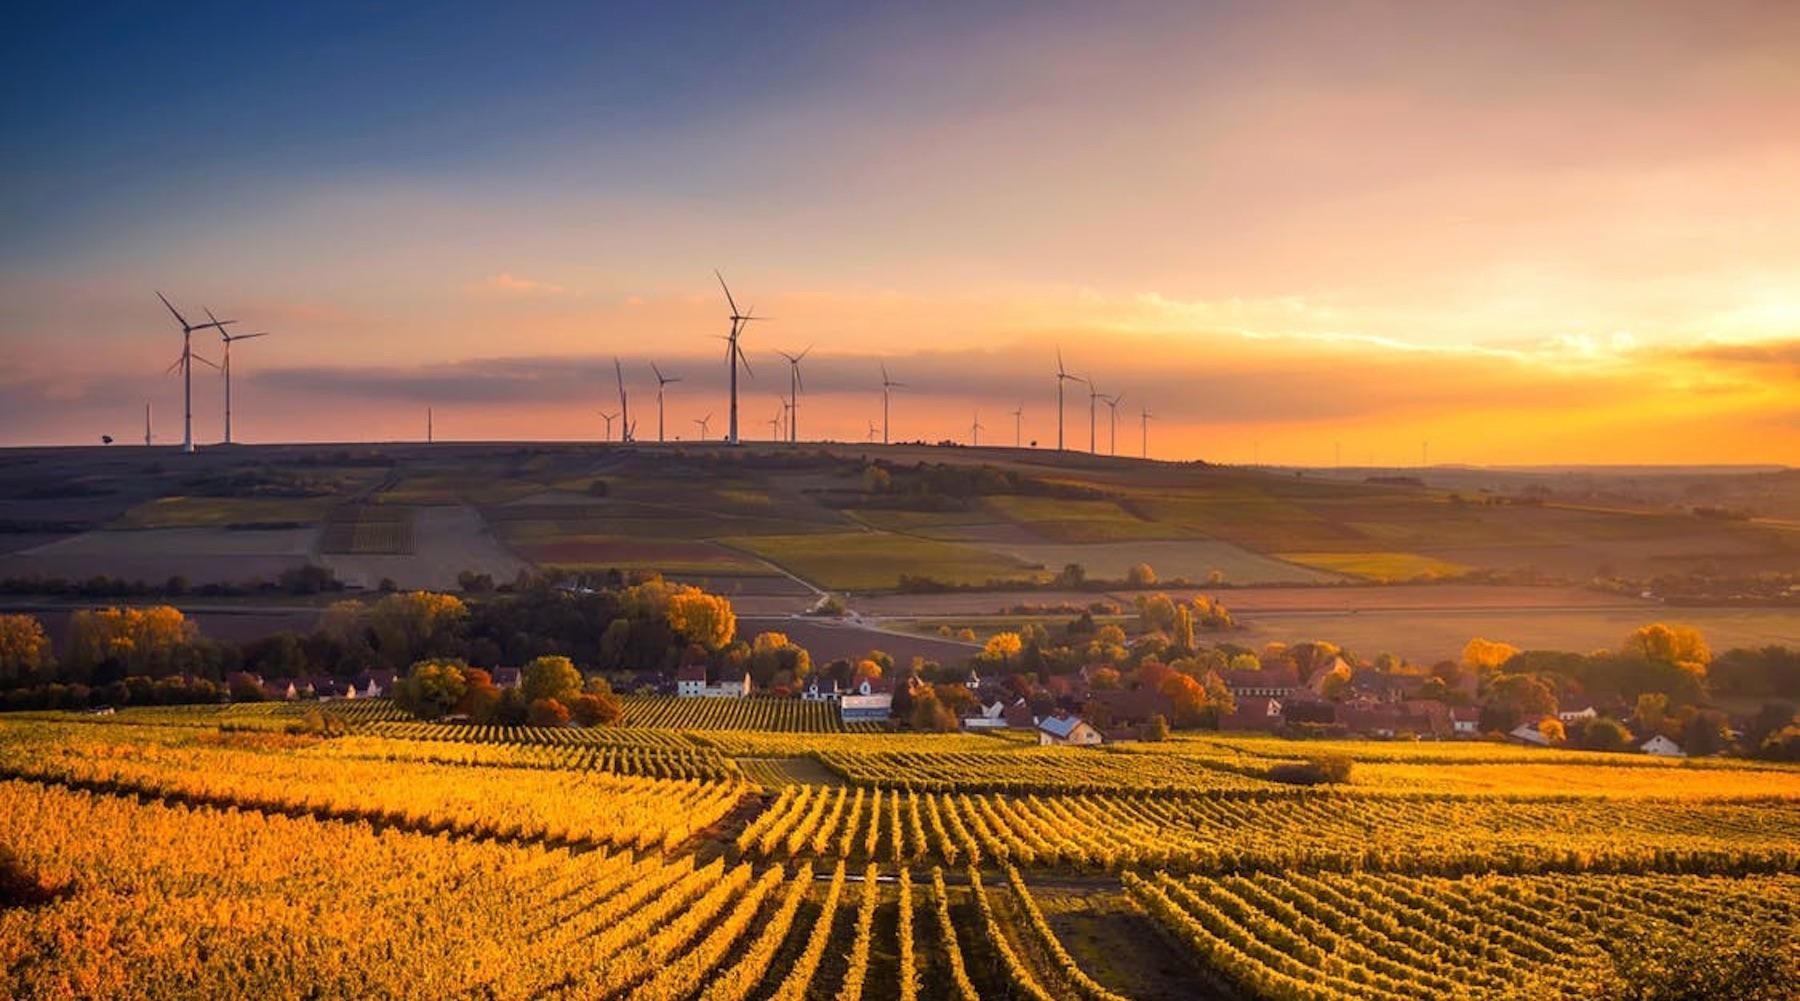 windfarm-1516033479064.jpg